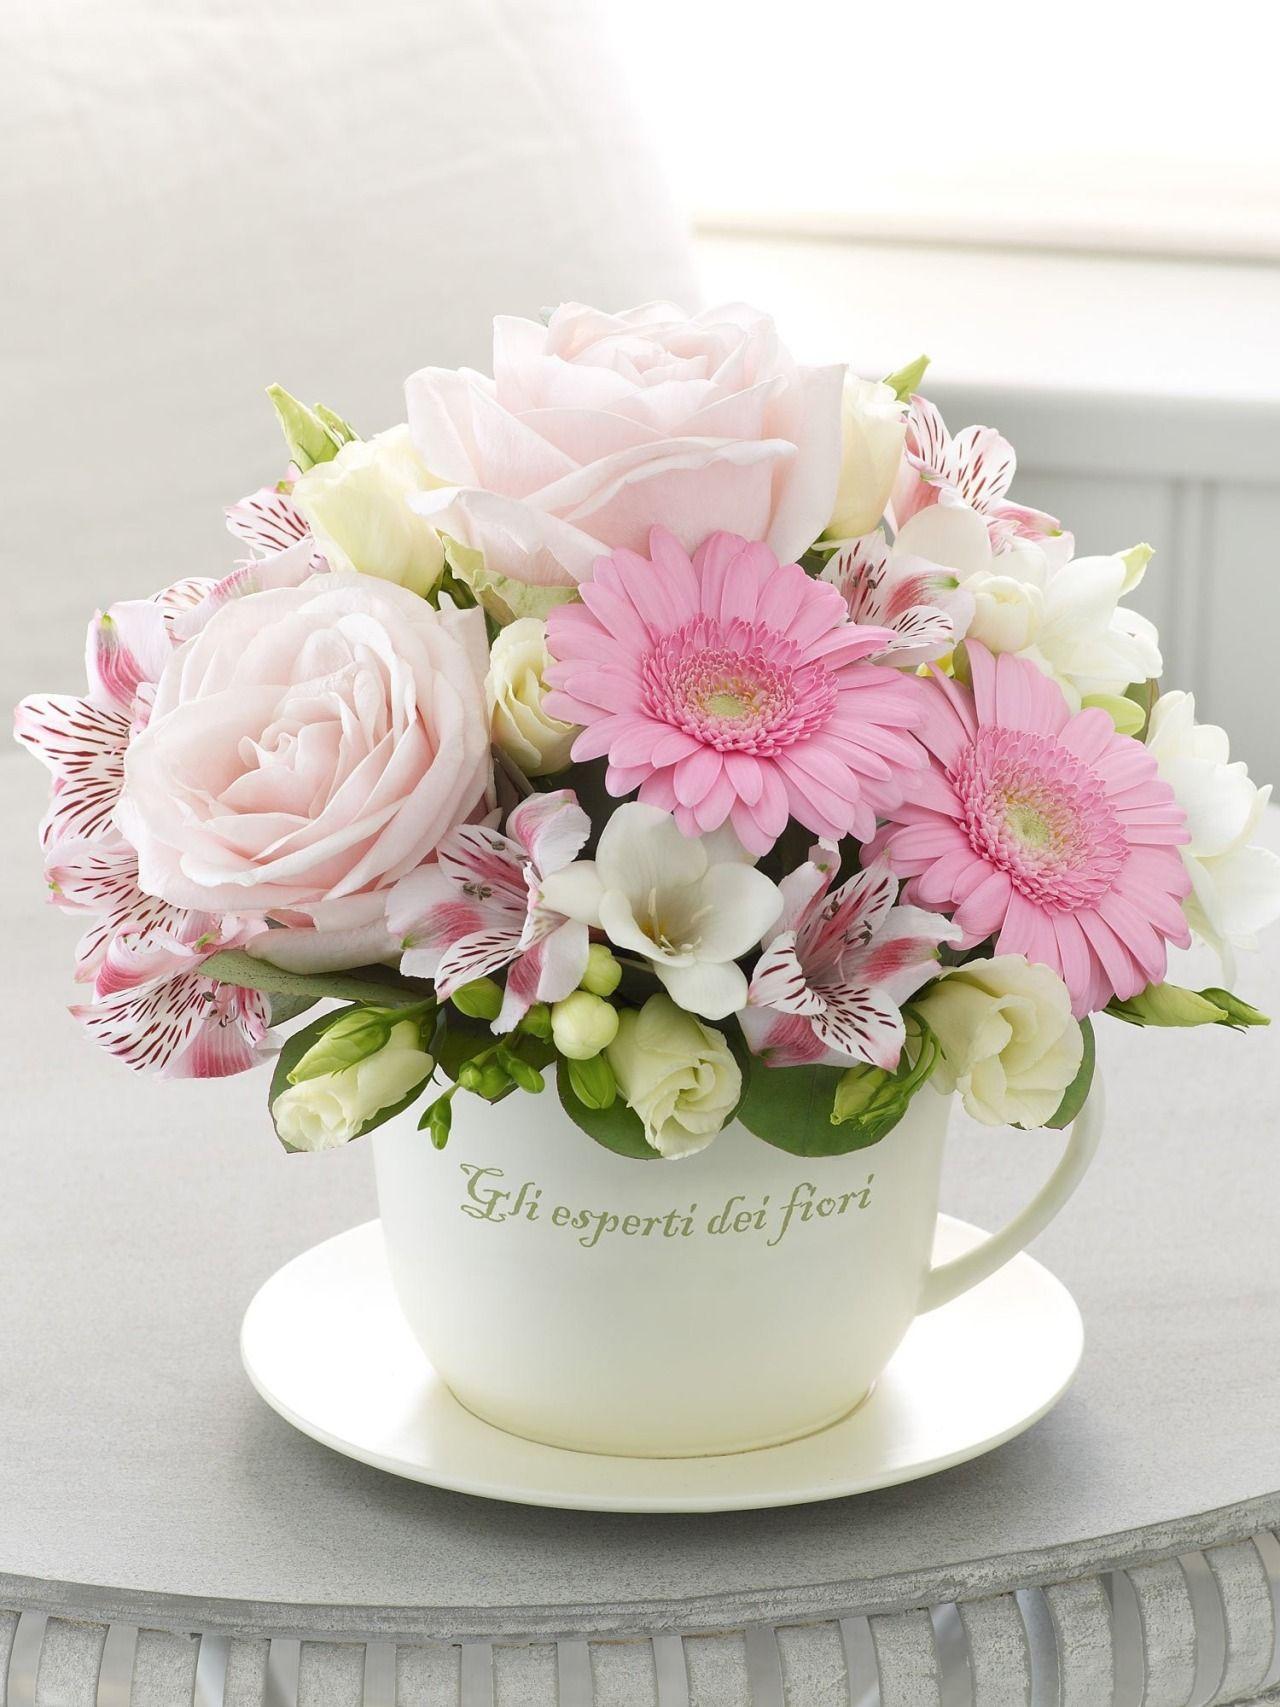 Shabby chic flowers in pinterest shabby flowers and shabby chic izmirmasajfo